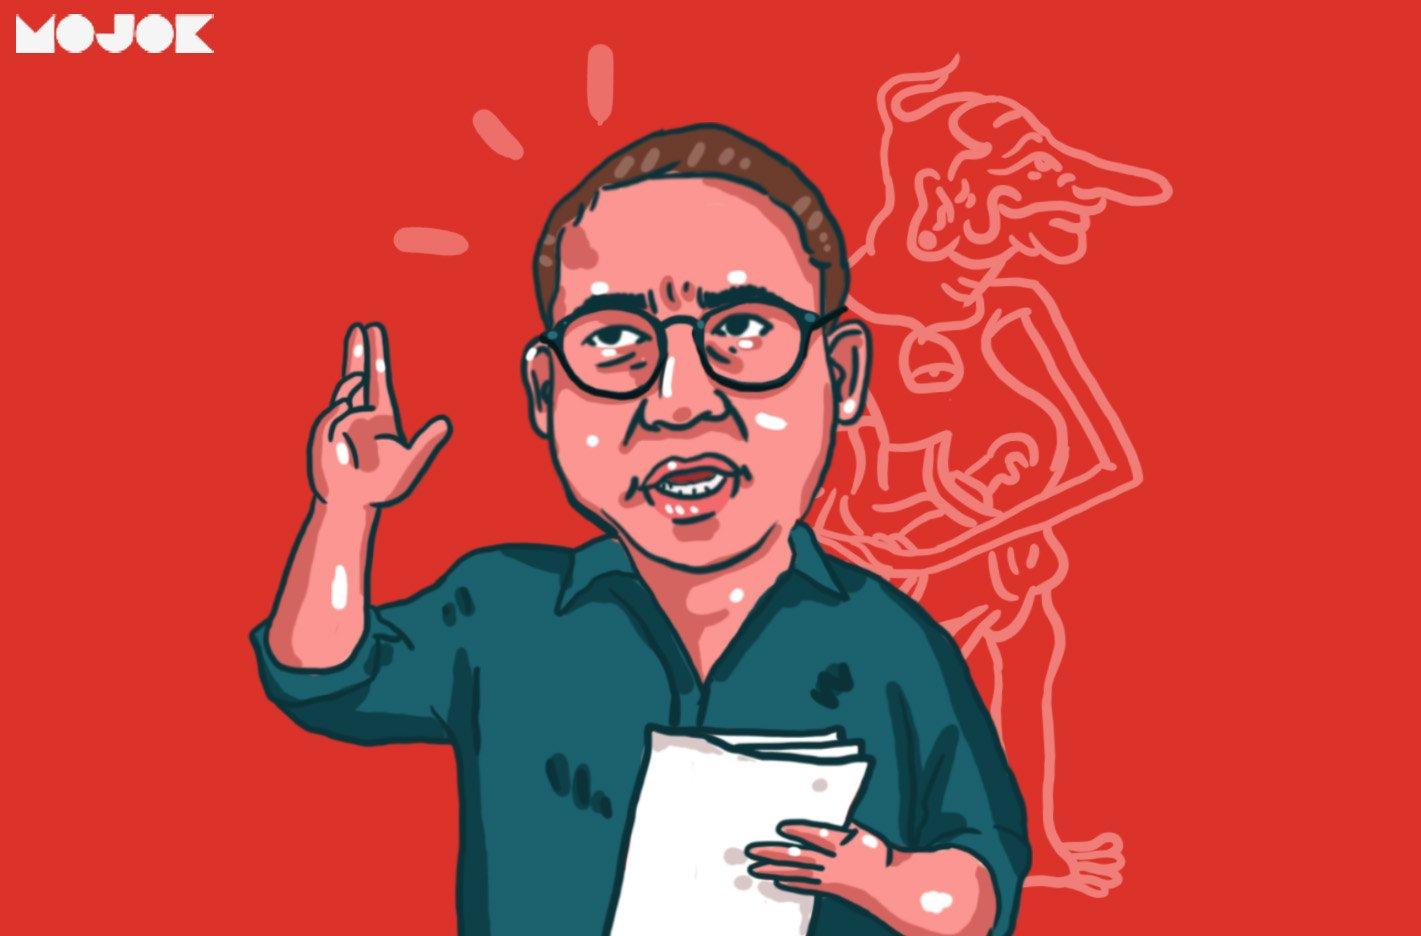 Puisi Fadli Zon: Puisi Petruk Jadi Raja Karya Fadli Zon: Sebuah Analisis